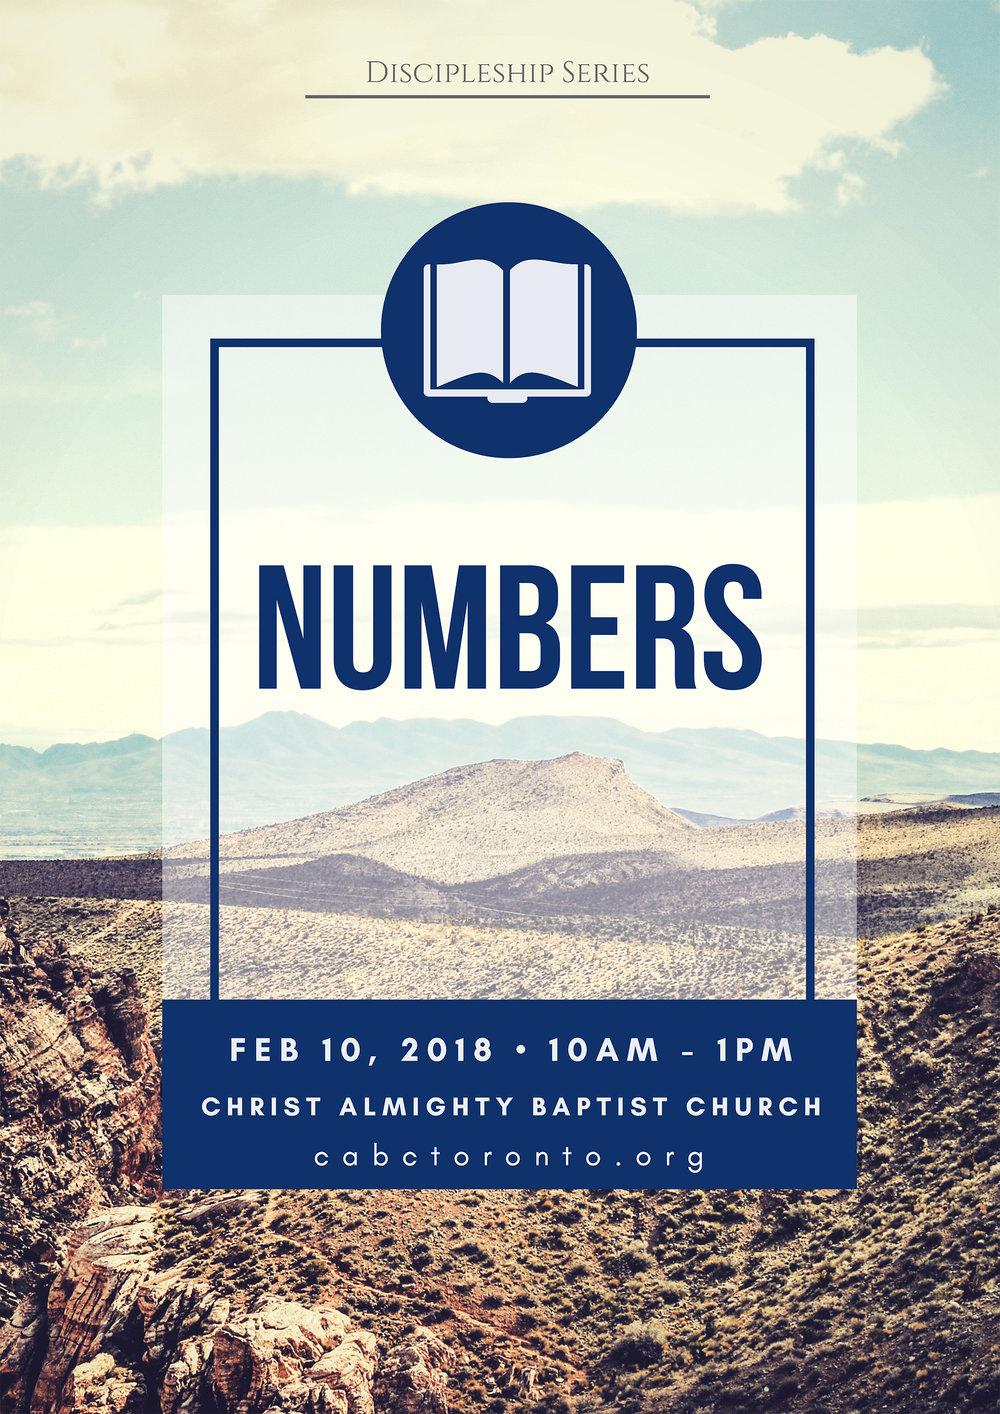 CABC-DiscipleshipSeries2018-Numbers.jpg